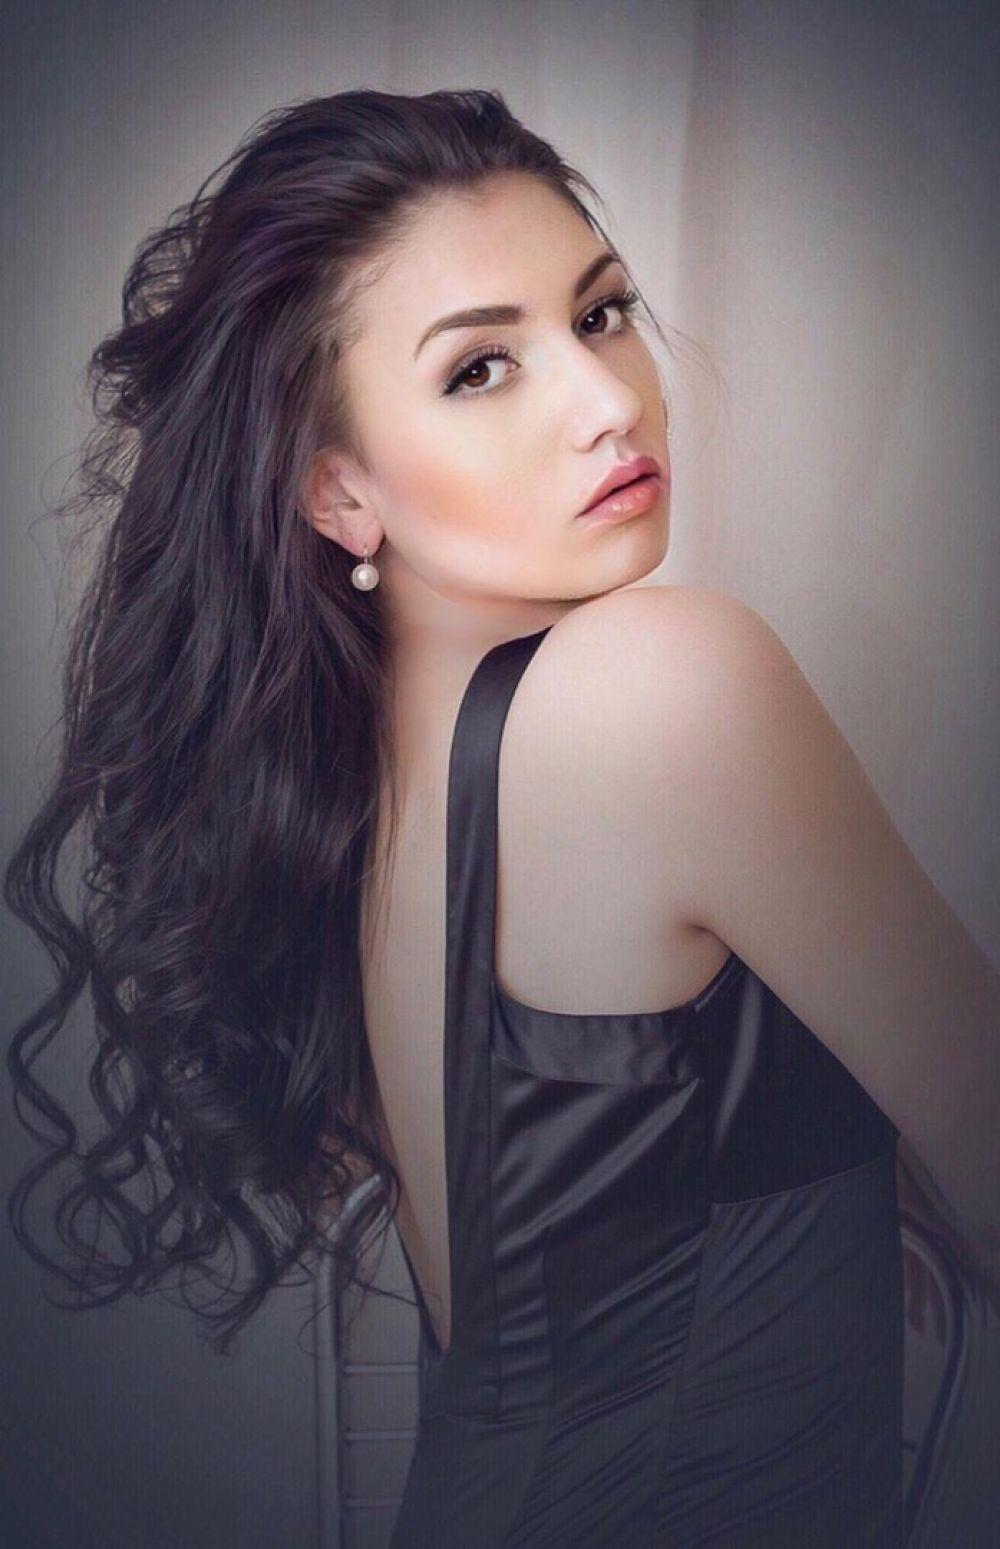 Екатерина Казакова, АО ВМП АВИТЕК